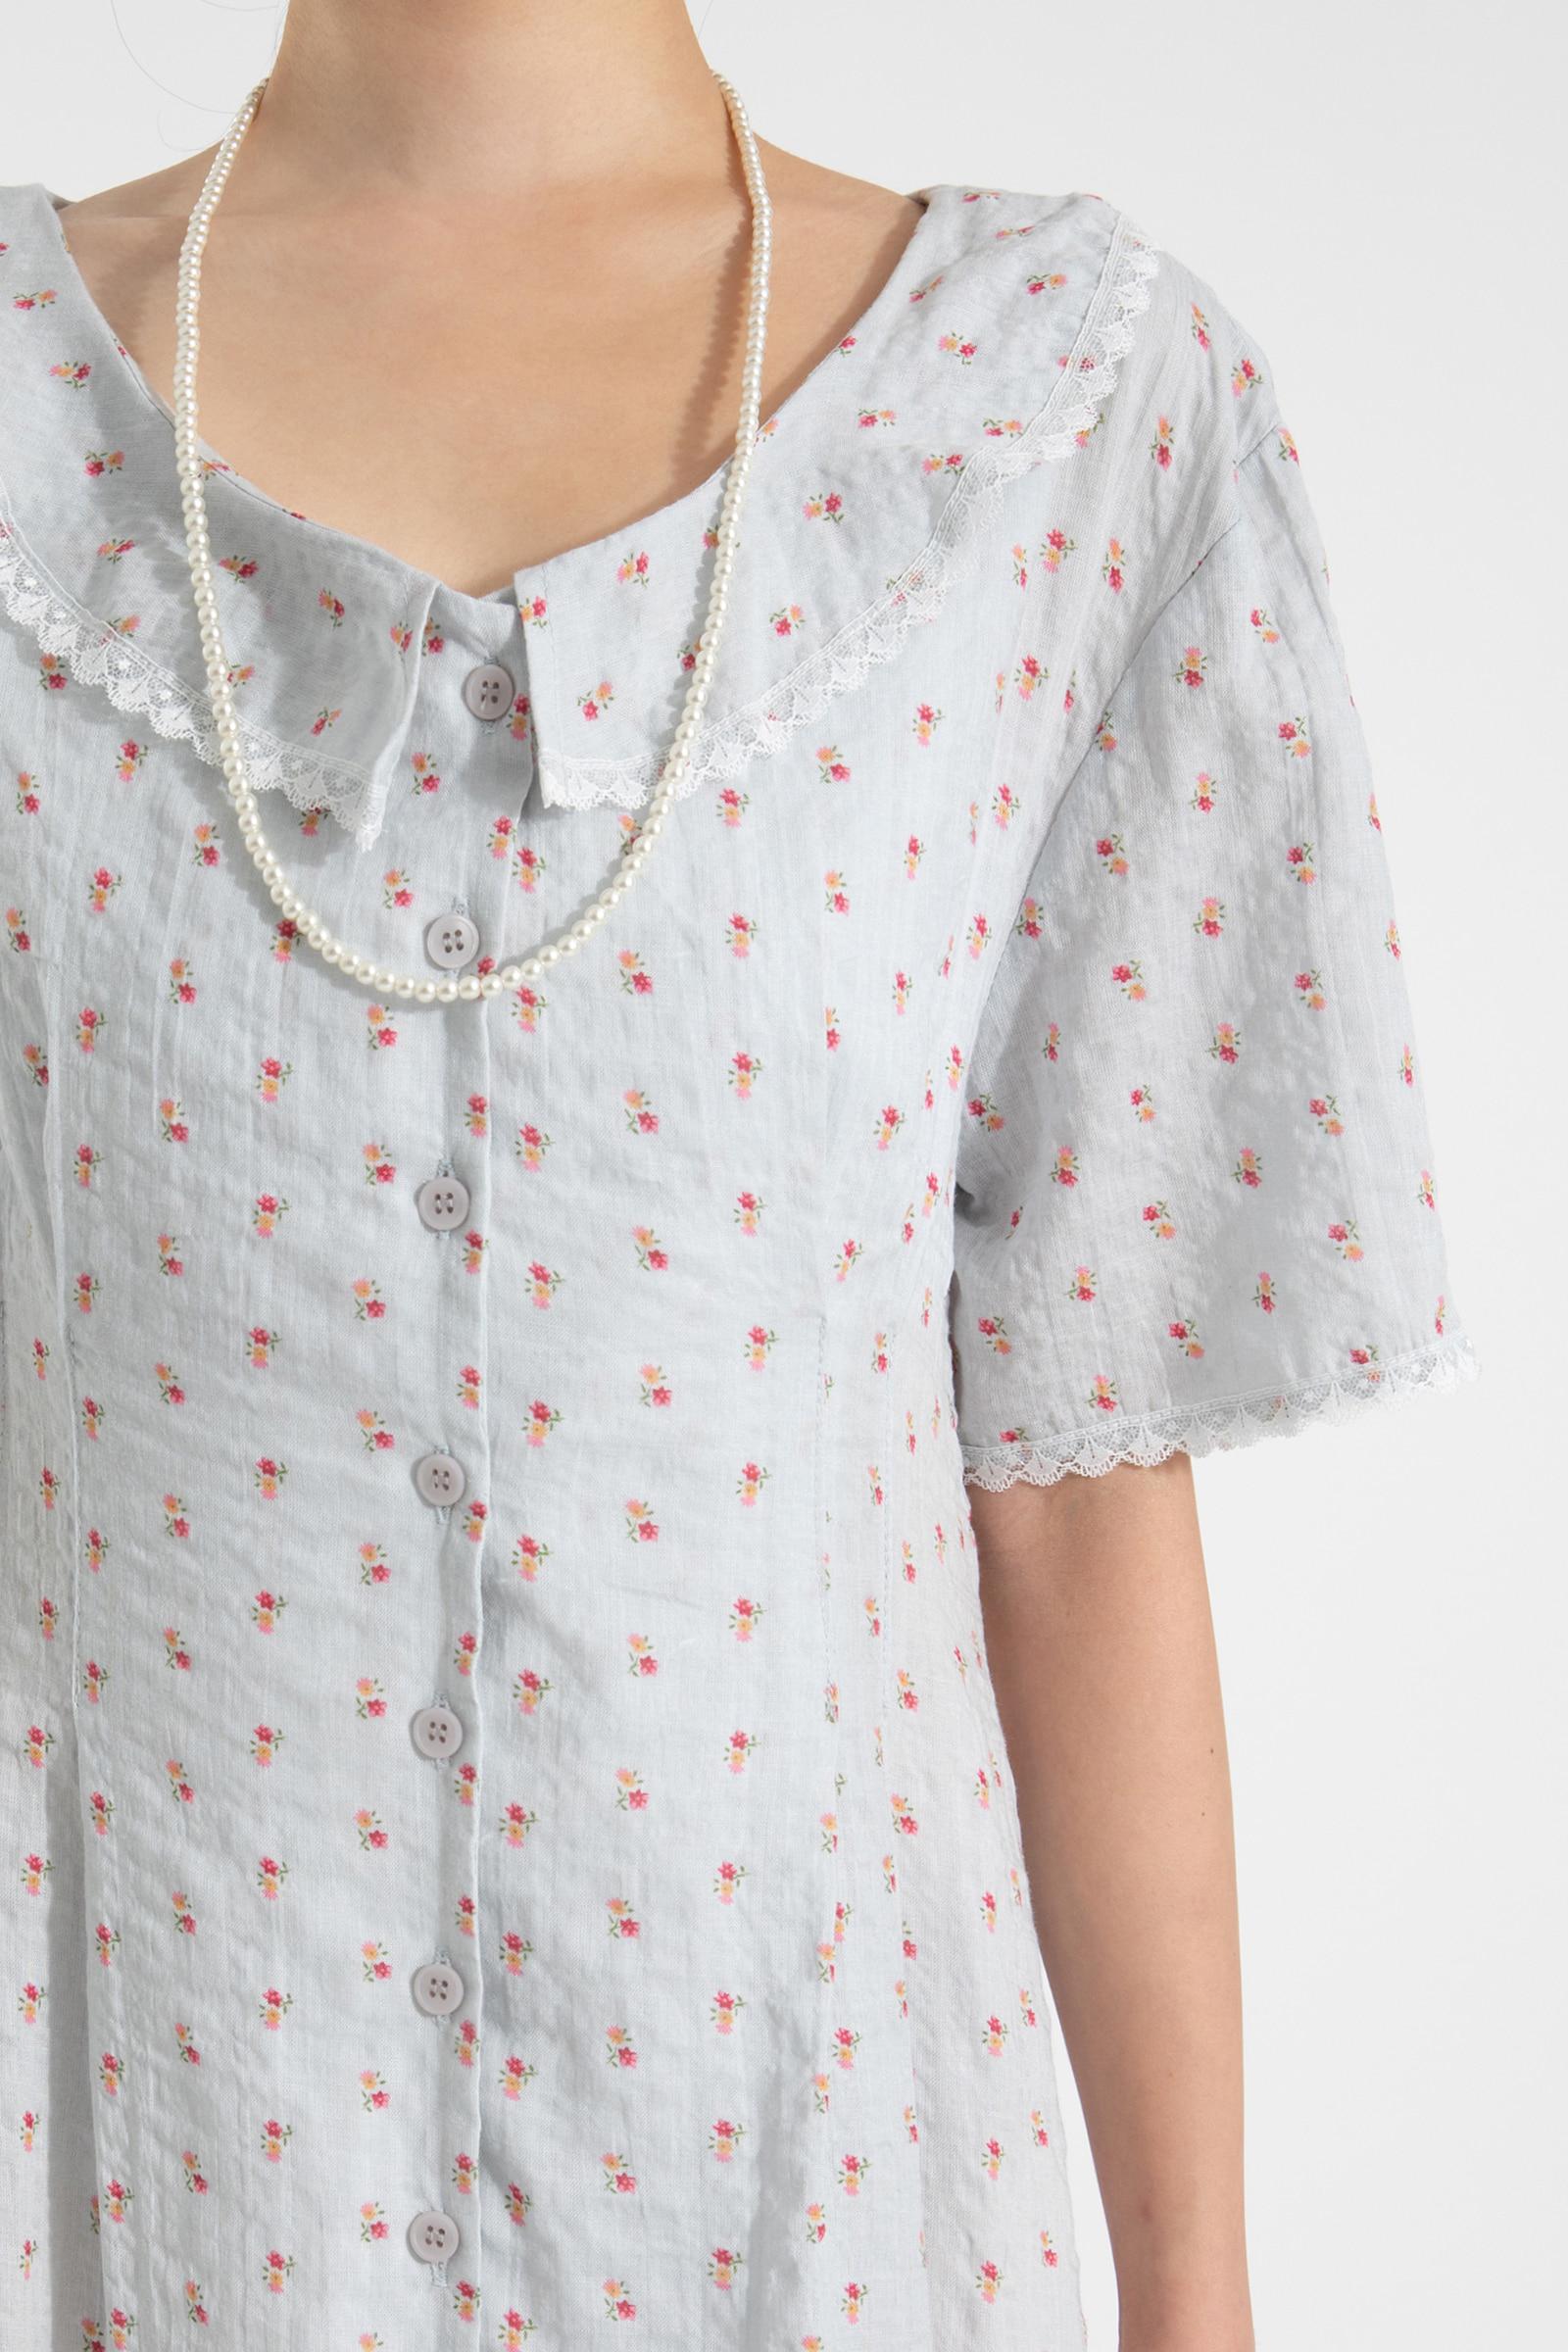 Adele floral collar maxi dress